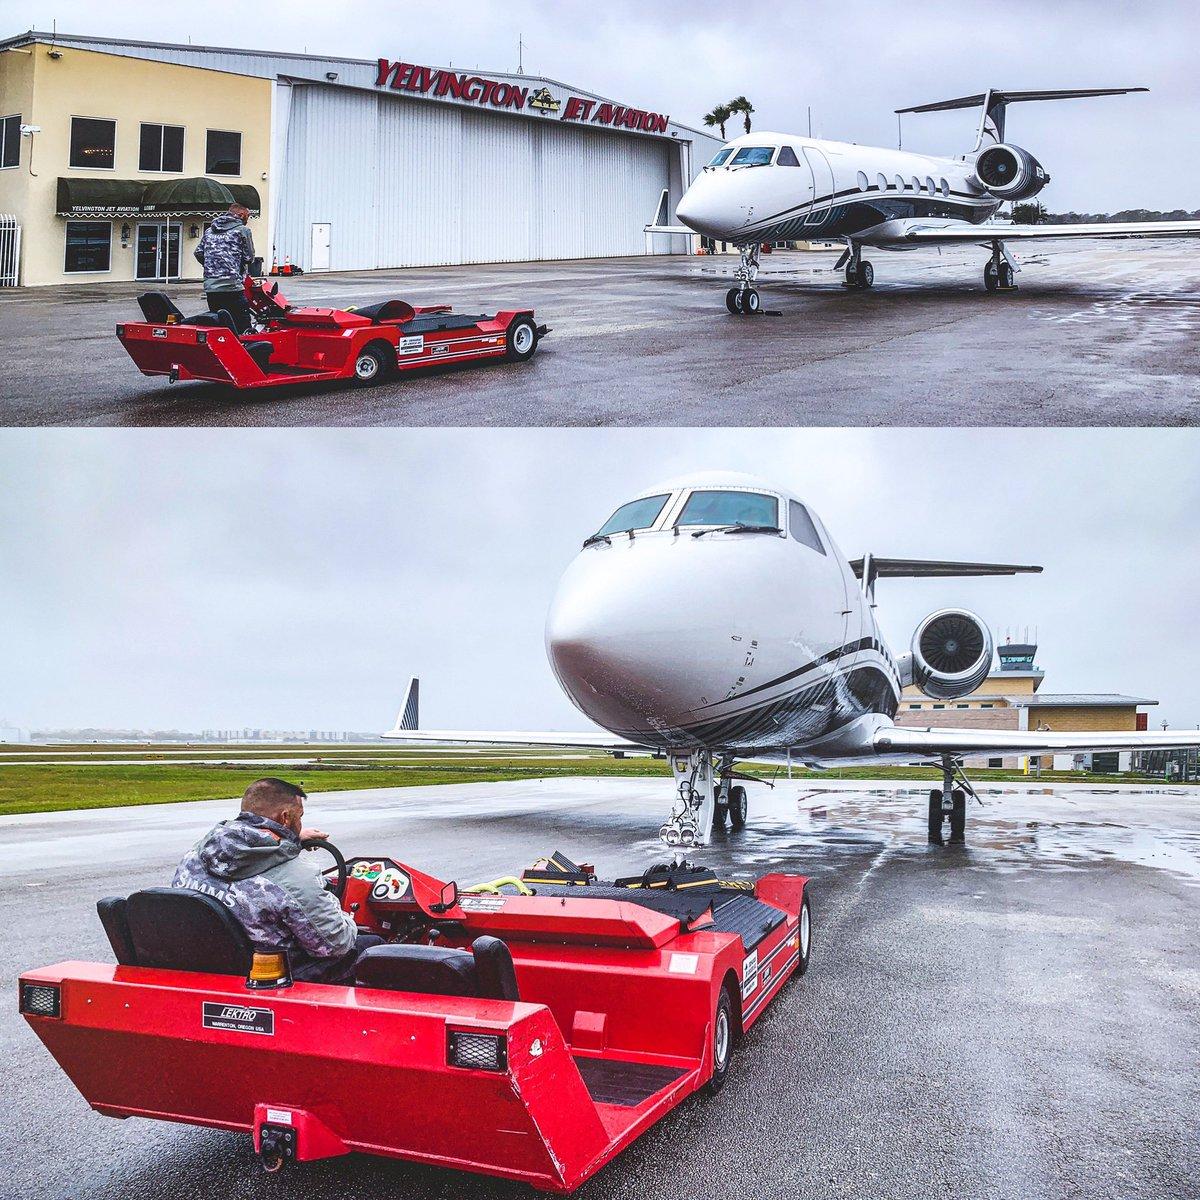 Yesterday 80°, today 50° and Russ loves it 🥶😁 crazy weather! . #yelvingtonjetaviation #Jet #Planes #DaytonaBeach  #daytonabeachinternationalairport #CustomerService #Aviation #kdab #avgeek #avgeeks #FBO #gulfstream #gulfstream450 #FiveStarService #privateairterminal